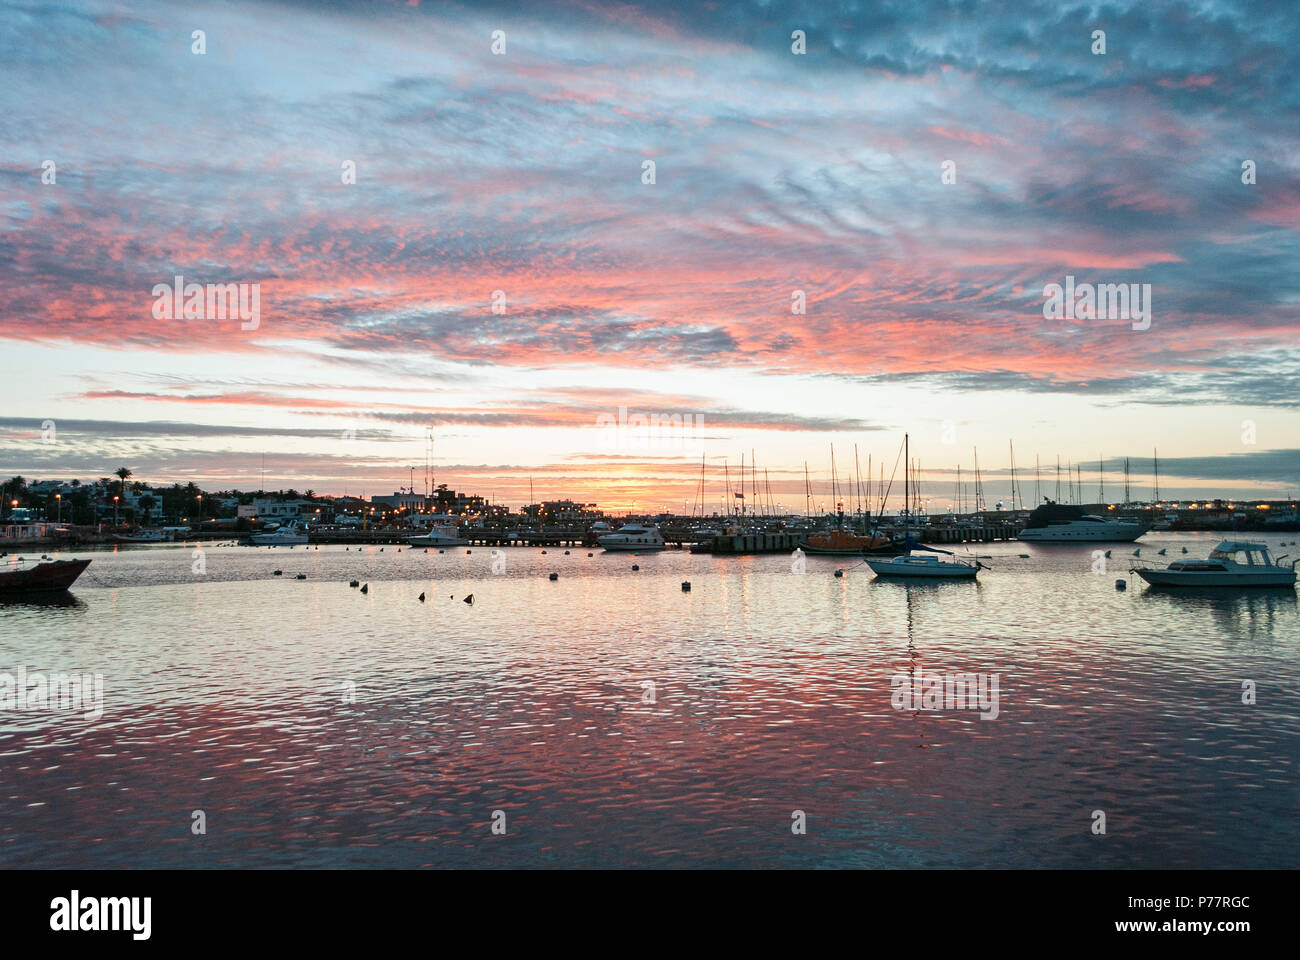 Stunning Sunset at Punta del Este Port, Uruguay. - Stock Image